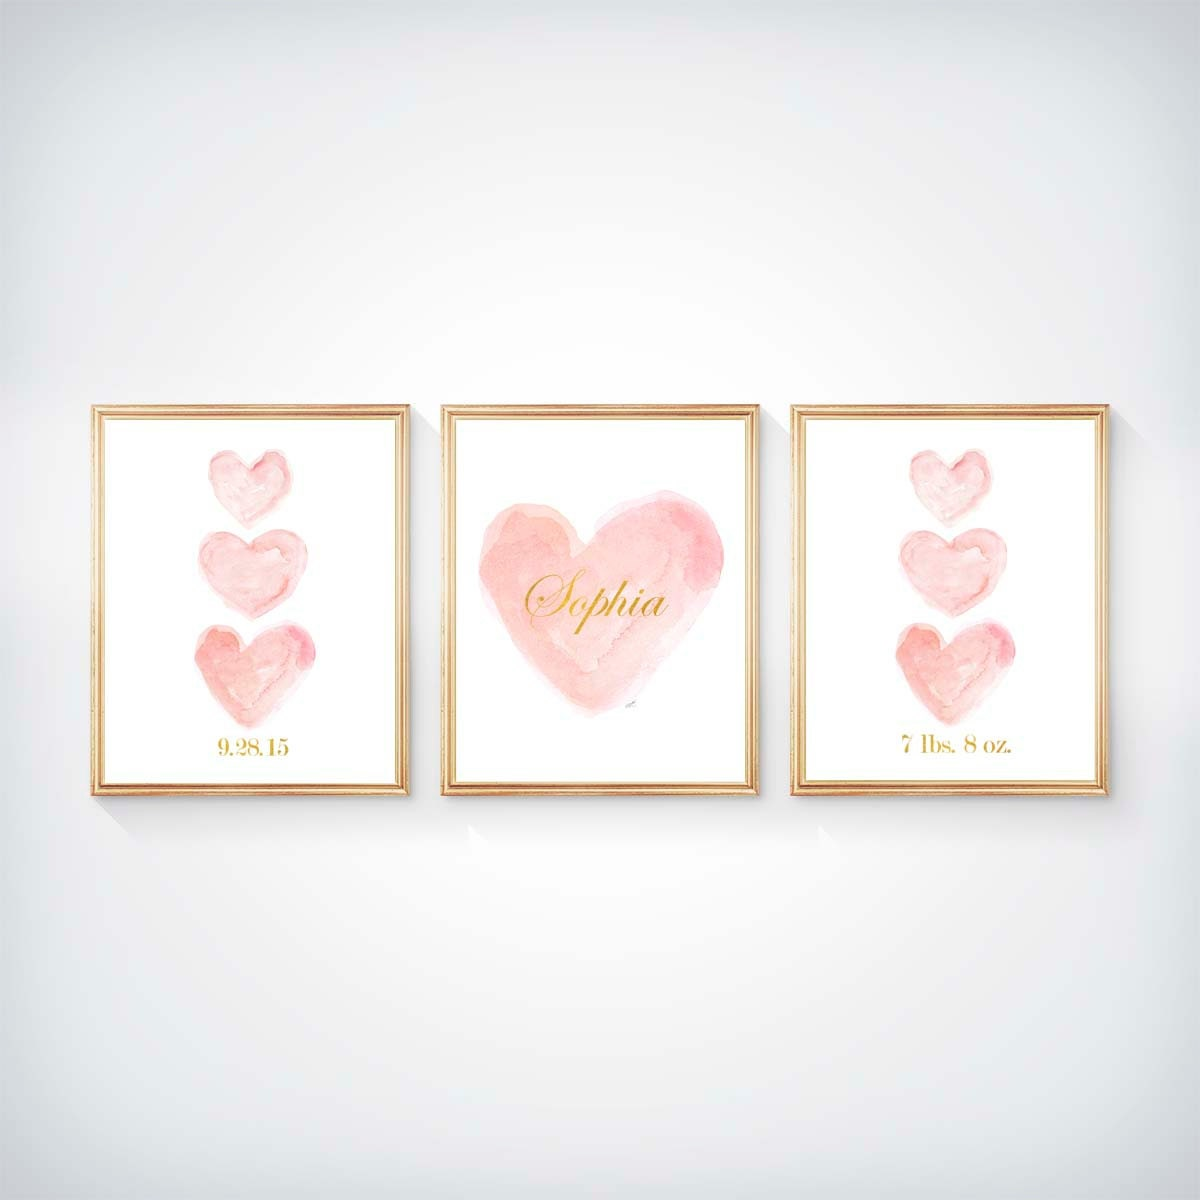 Blush Nursery With Neutral Textures: Blush Prints Nursery Wall Art Blush Nursery Blush And Gold